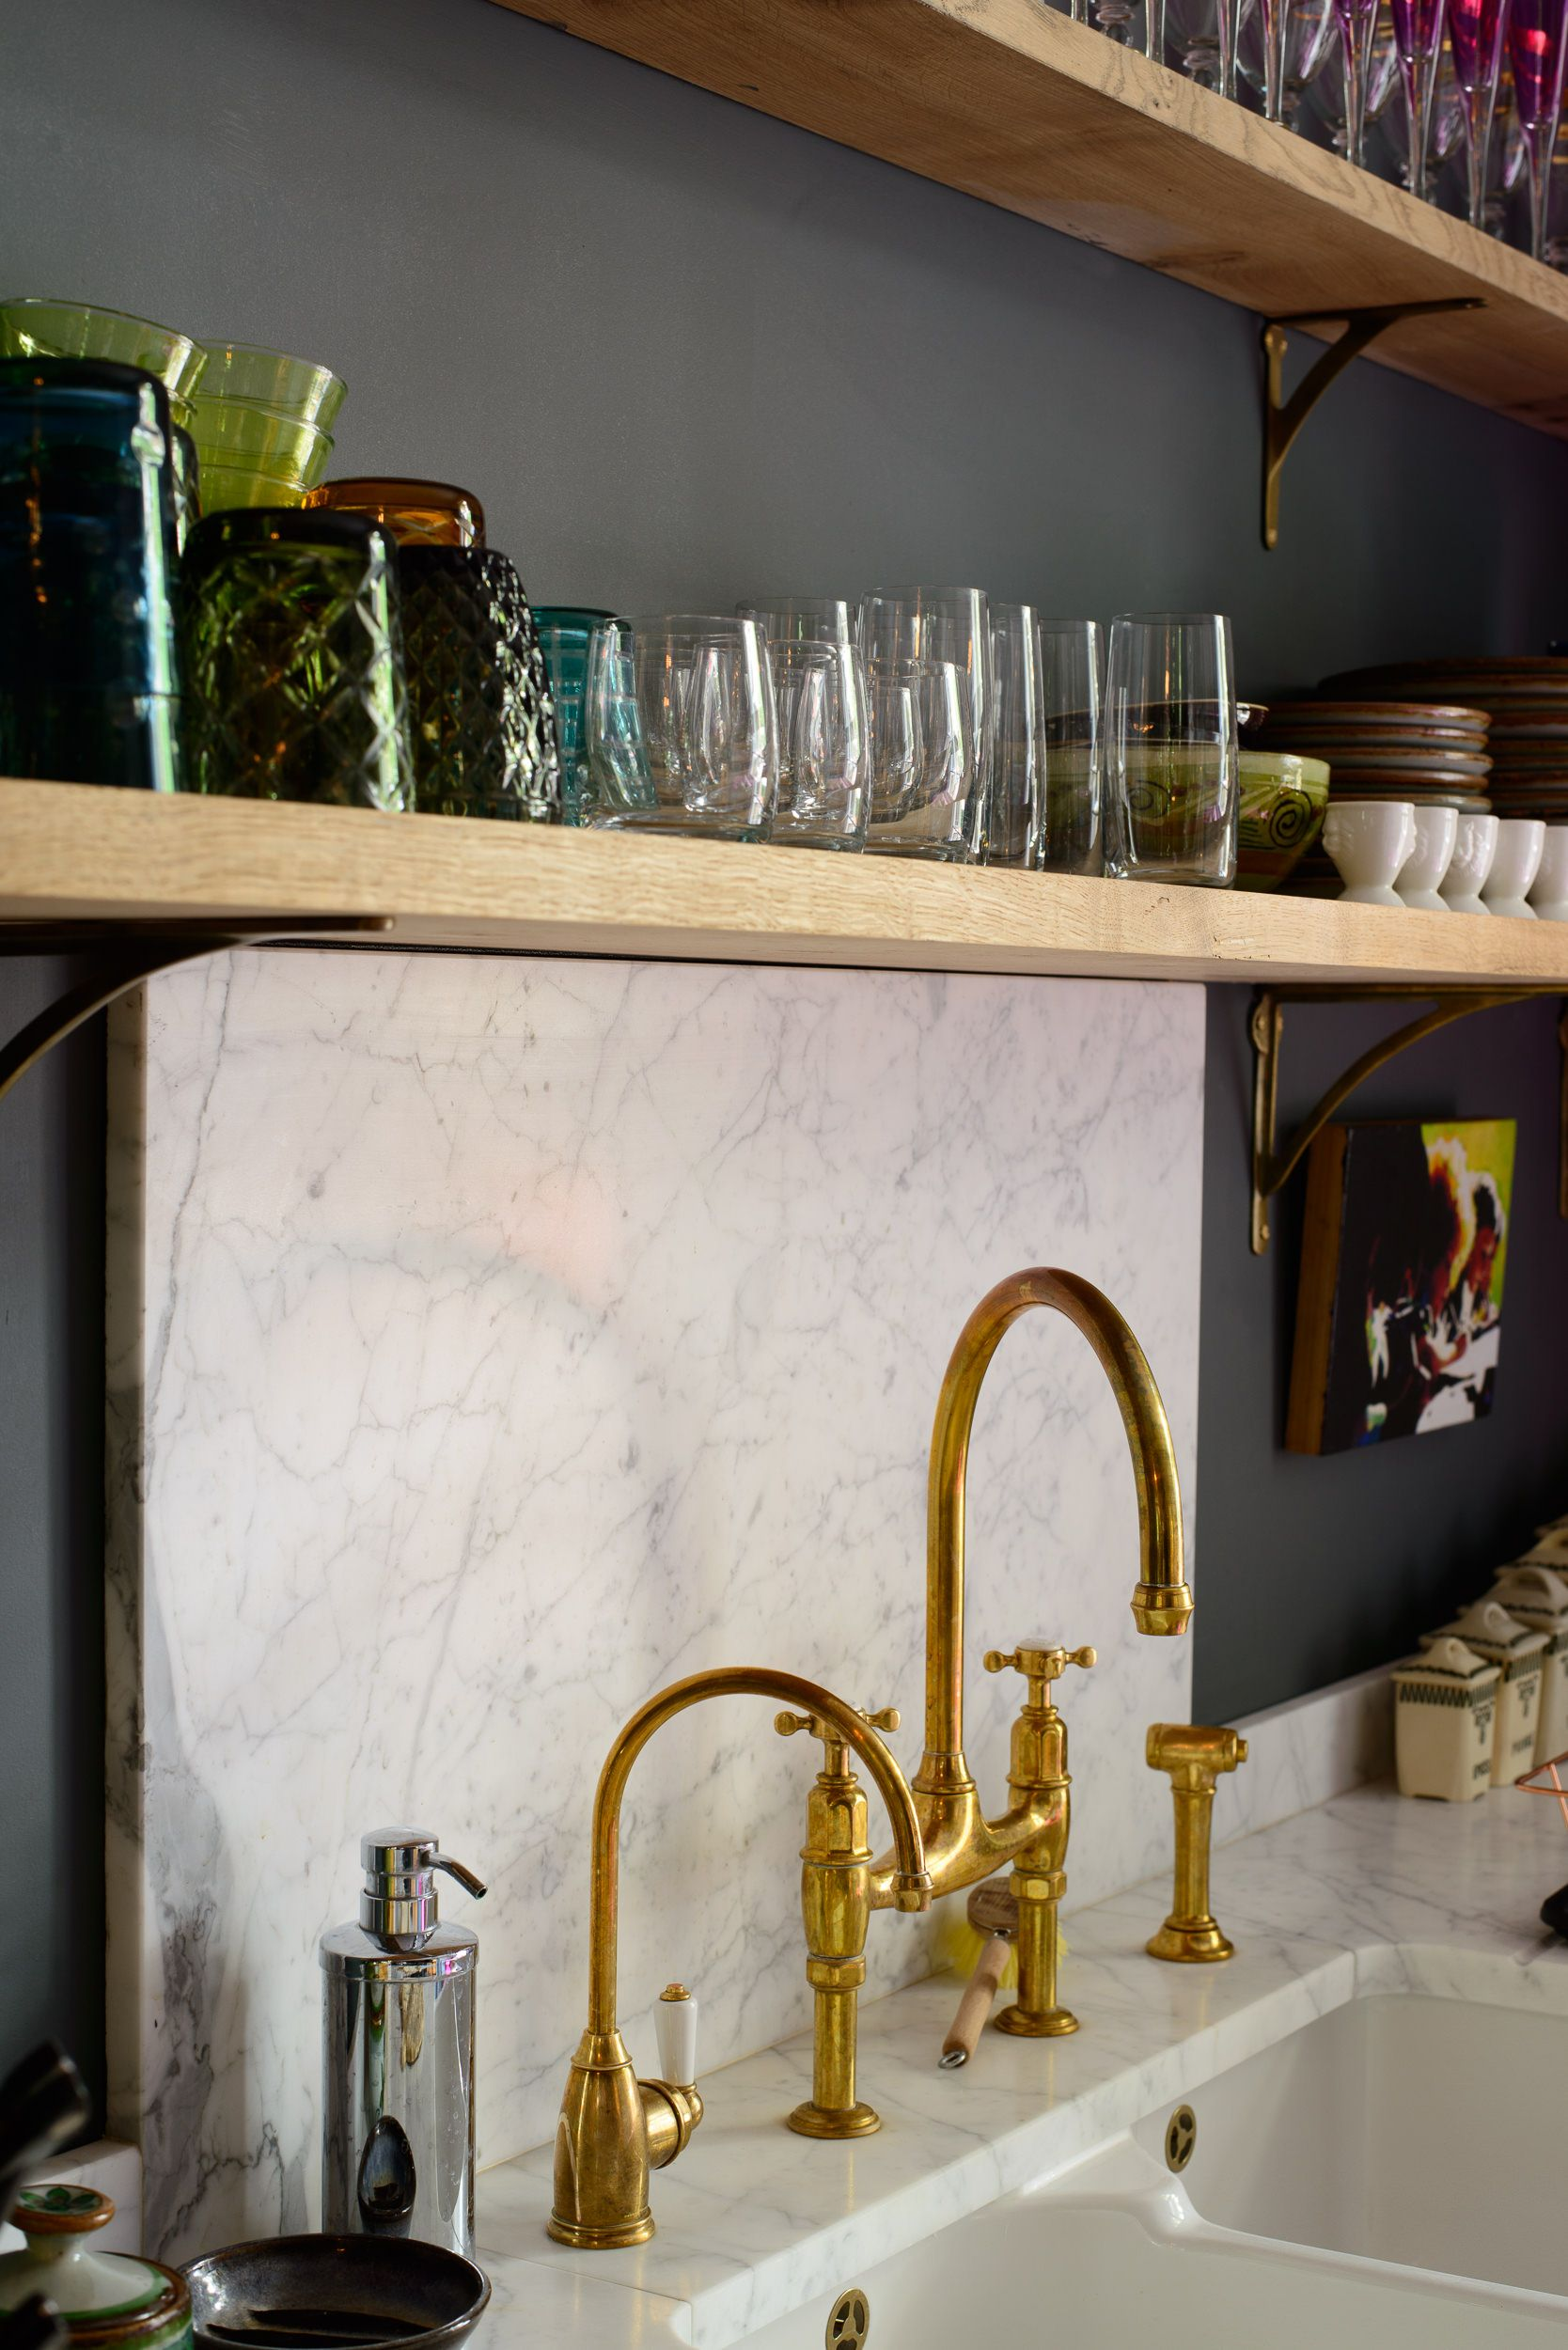 Image result for devol kitchen instagram perrin rowe english beech marmorino venetian plaster walls